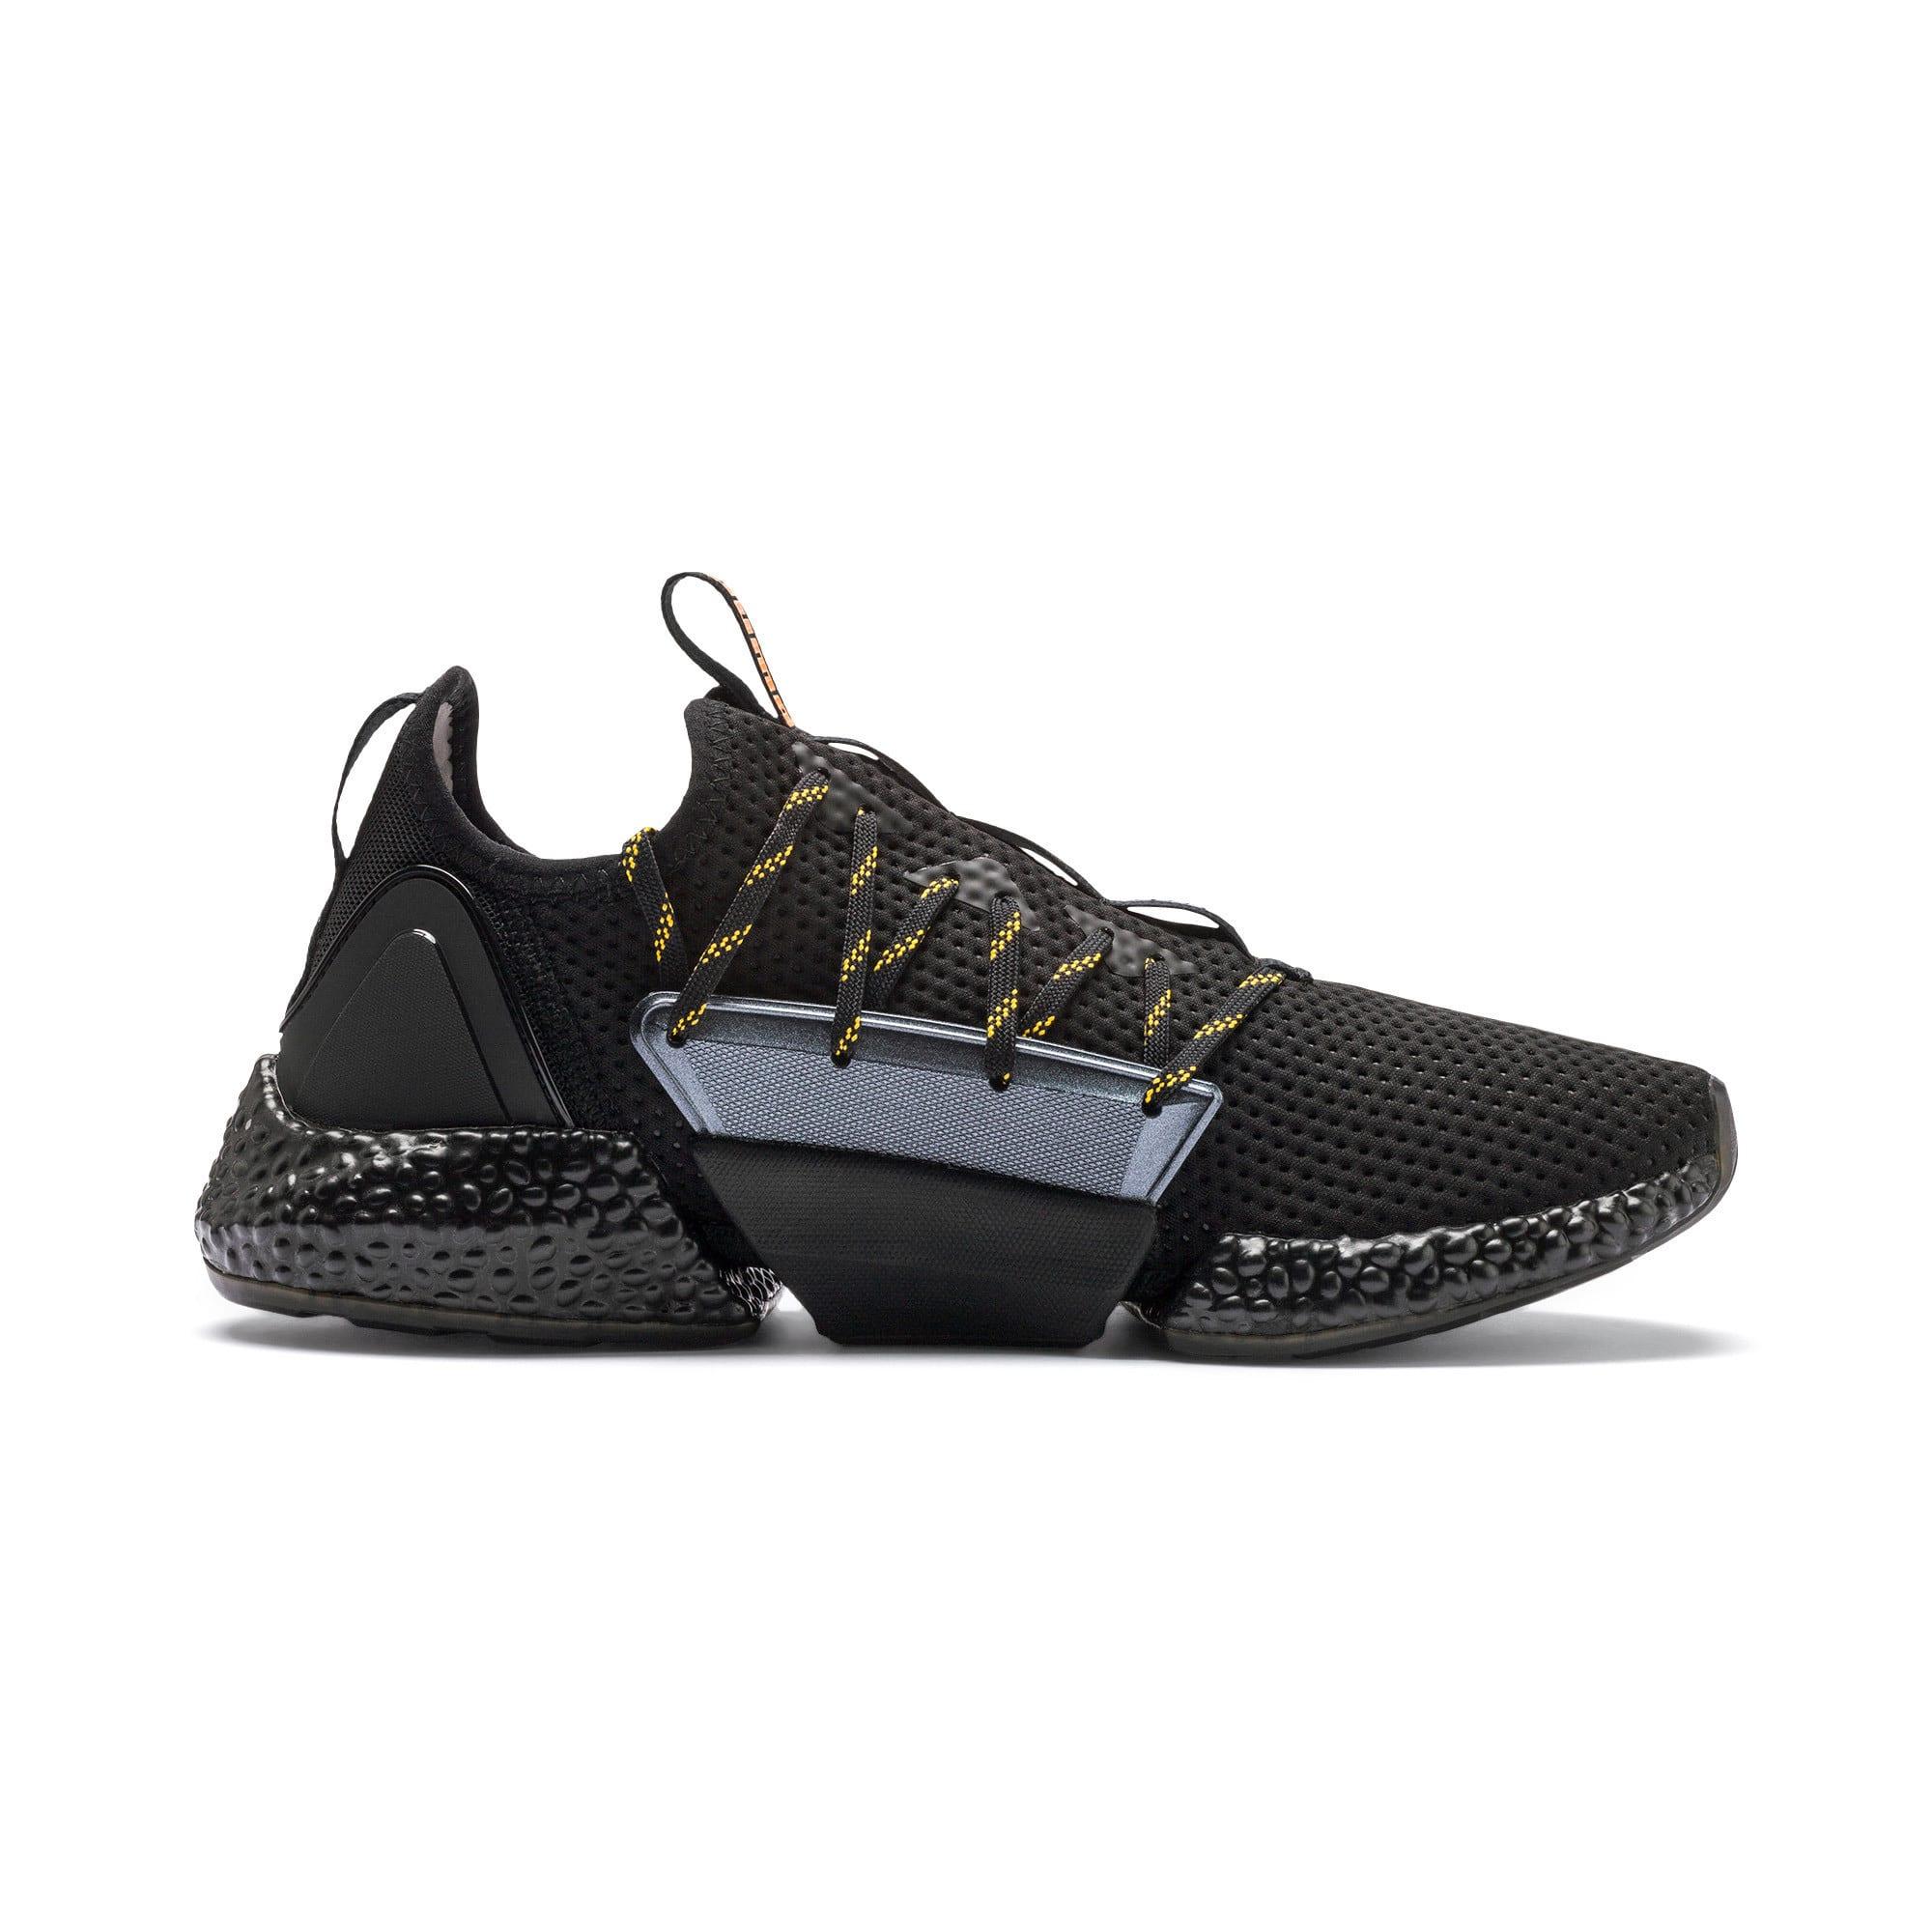 Thumbnail 6 of HYBRID Rocket Aero Men's Running Shoes, Puma Black-Puma Black, medium